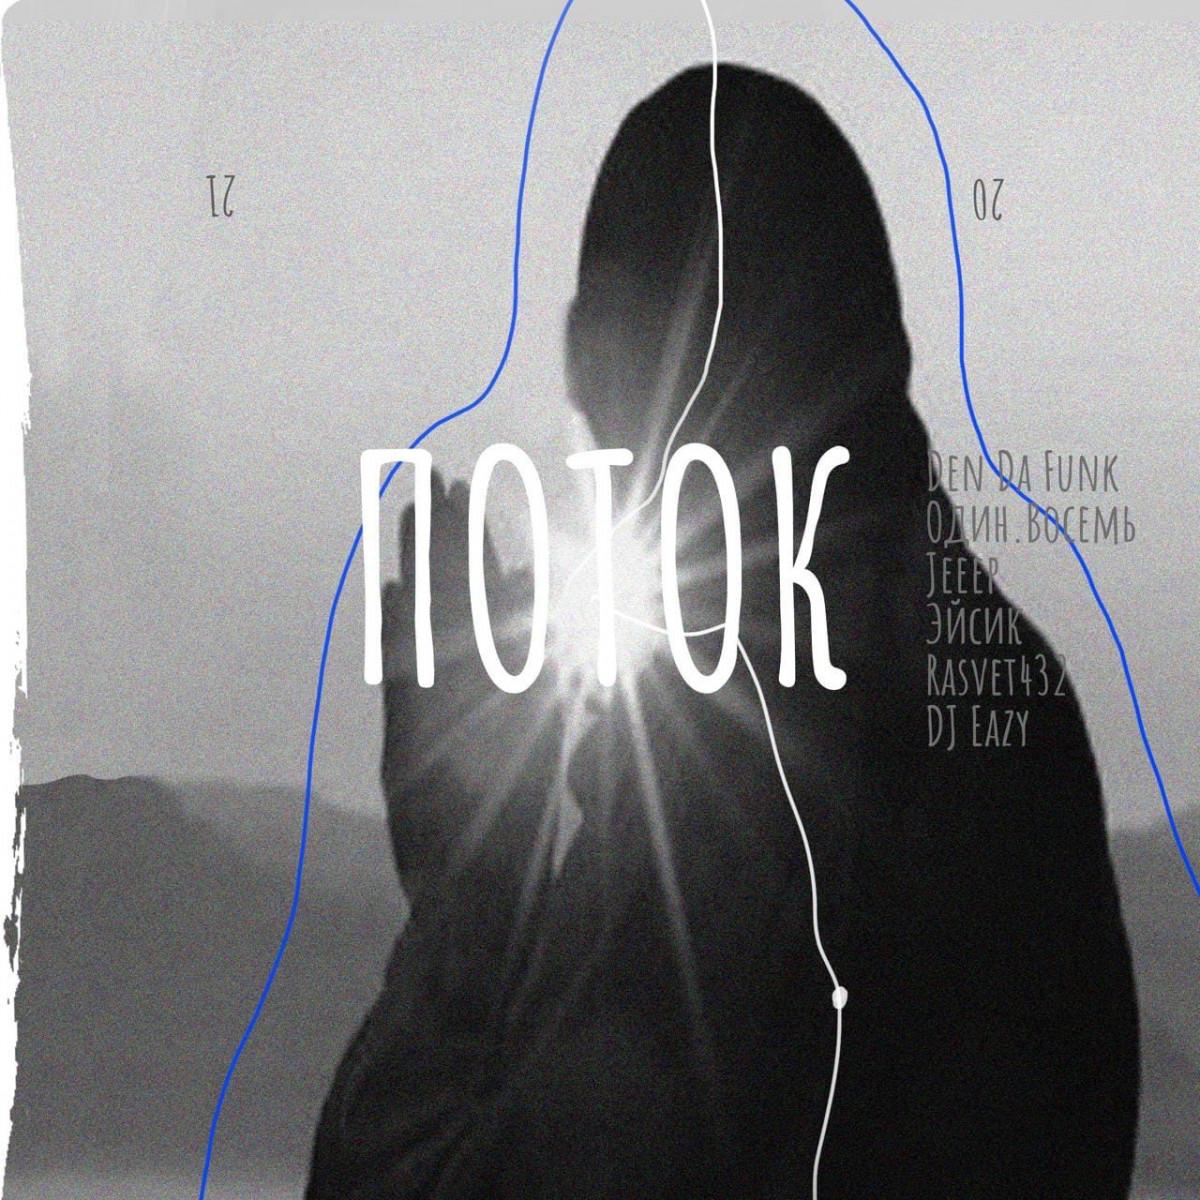 Den Da Funk — «Поток» (feat. Эйсик, Один.Восемь & Jeeep